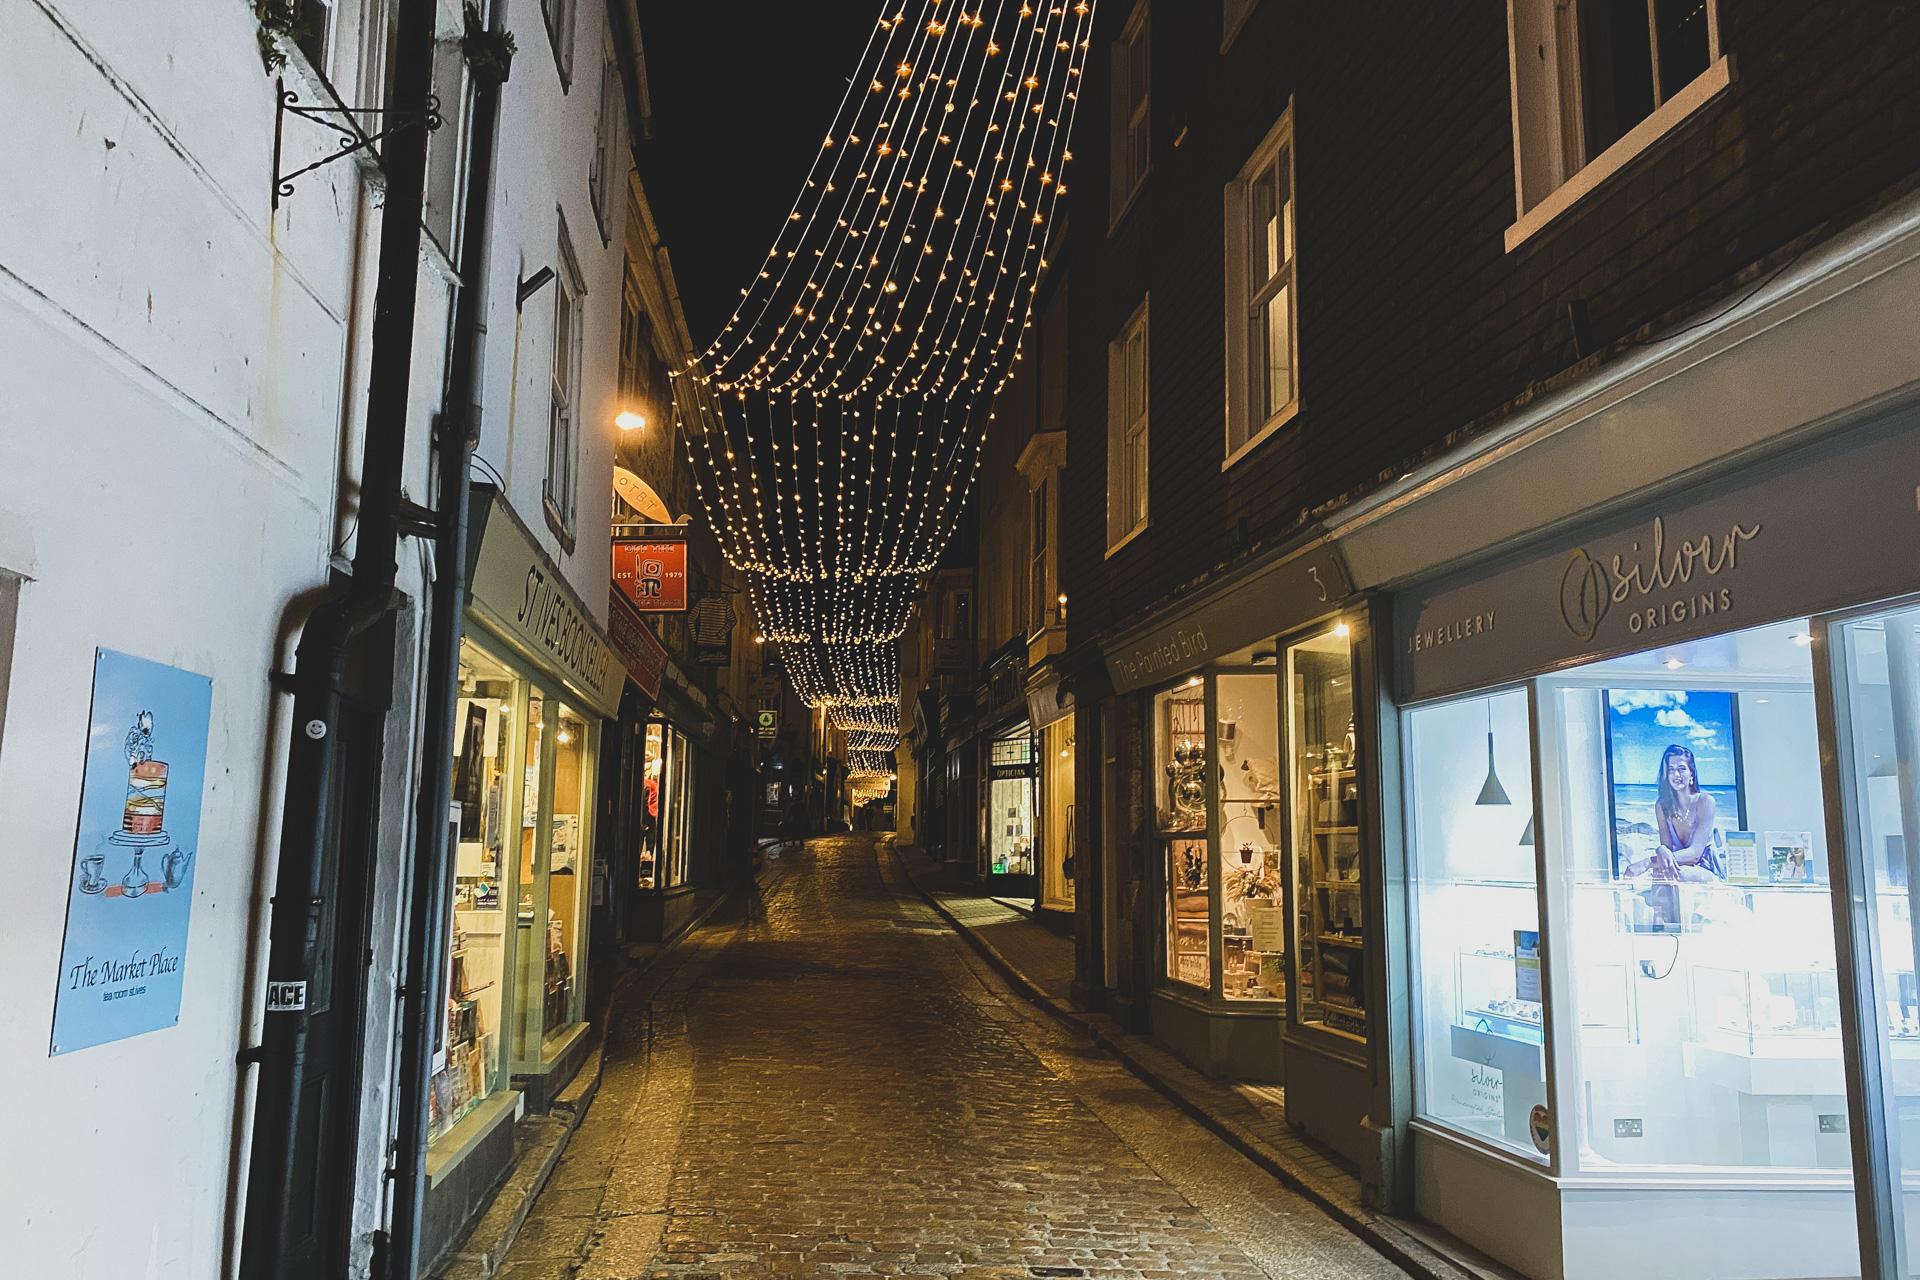 St Ives Bid Fore Street Lights-2020